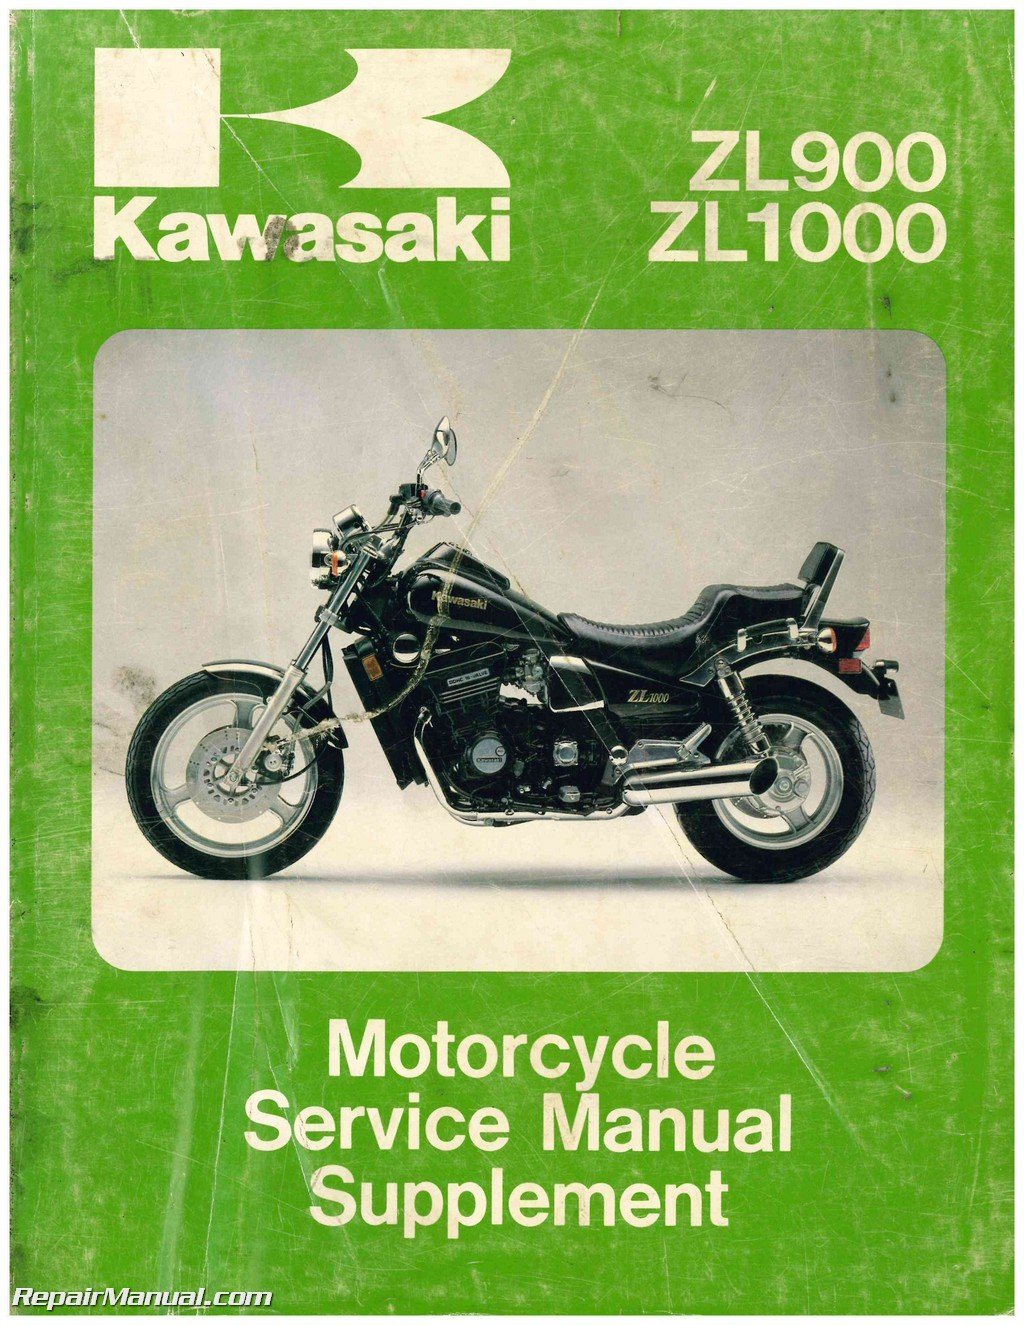 99924-1077-52 1985-1988 Kawasaki ZL900 ZL1000 Eliminator Motorcycle Service  Manual Supplement: Manufacturer: Amazon.com: Books